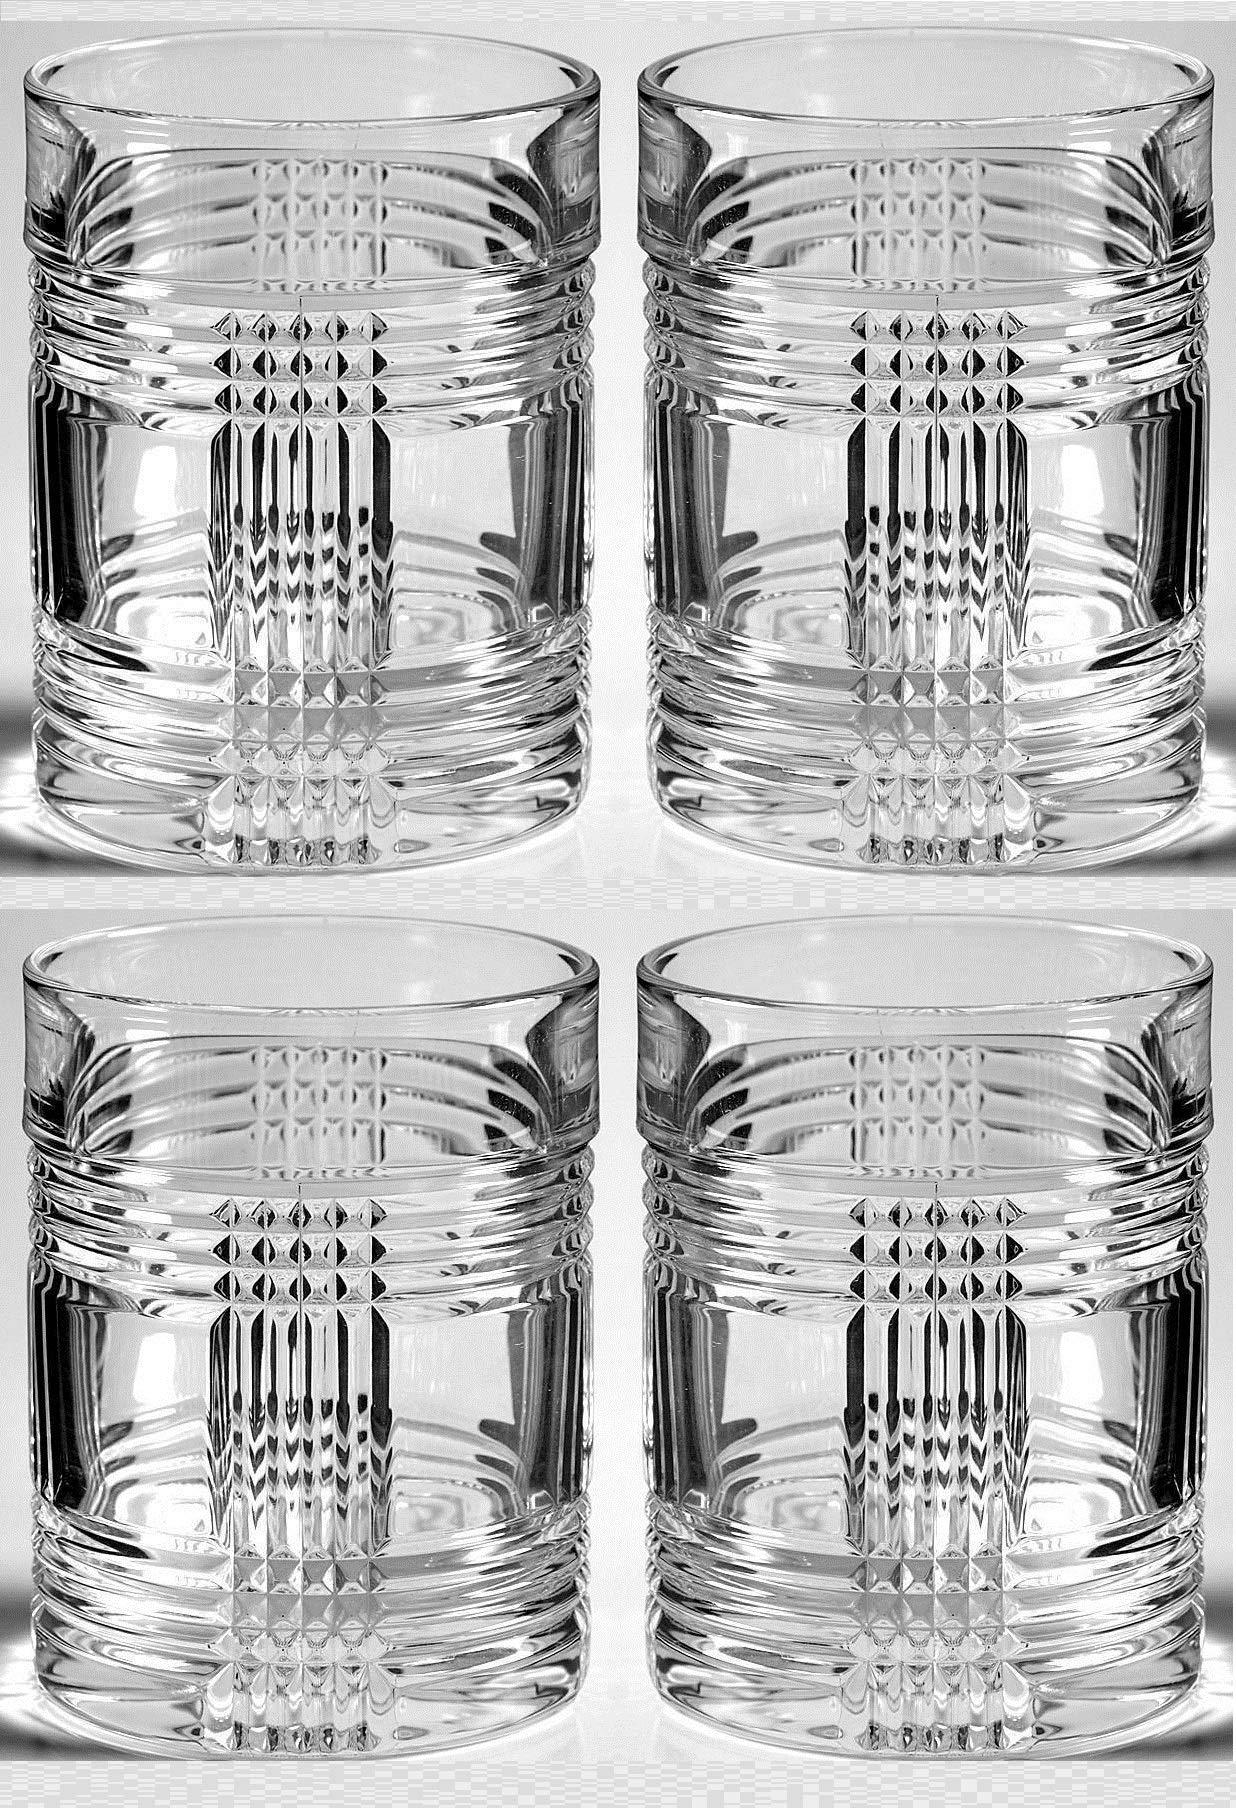 Ralph Lauren Glenplaid Double Old Fashioned Glass (Set of 4)